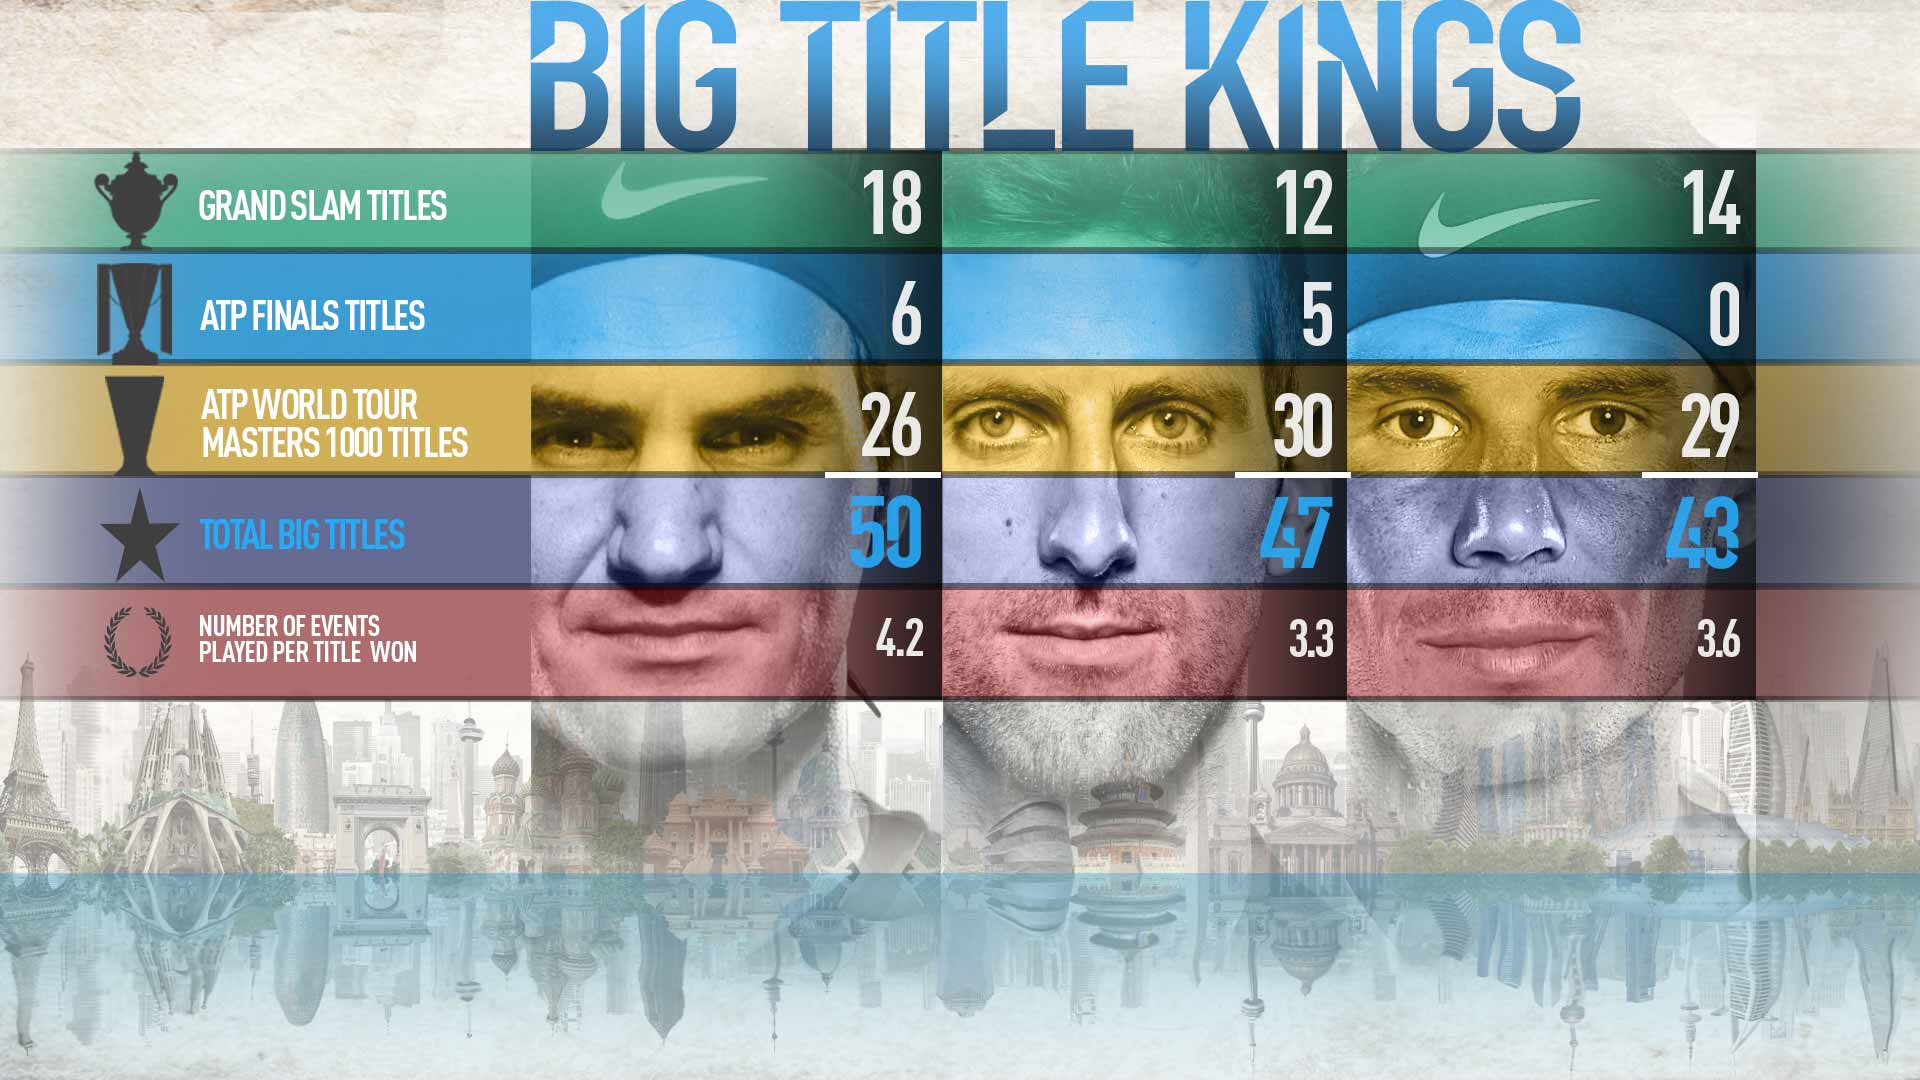 Rafael Nadal Narrows Distance Between Himself And Novak Djokovic Roger Federer In Hunt For Big Titles Atp Tour Tennis